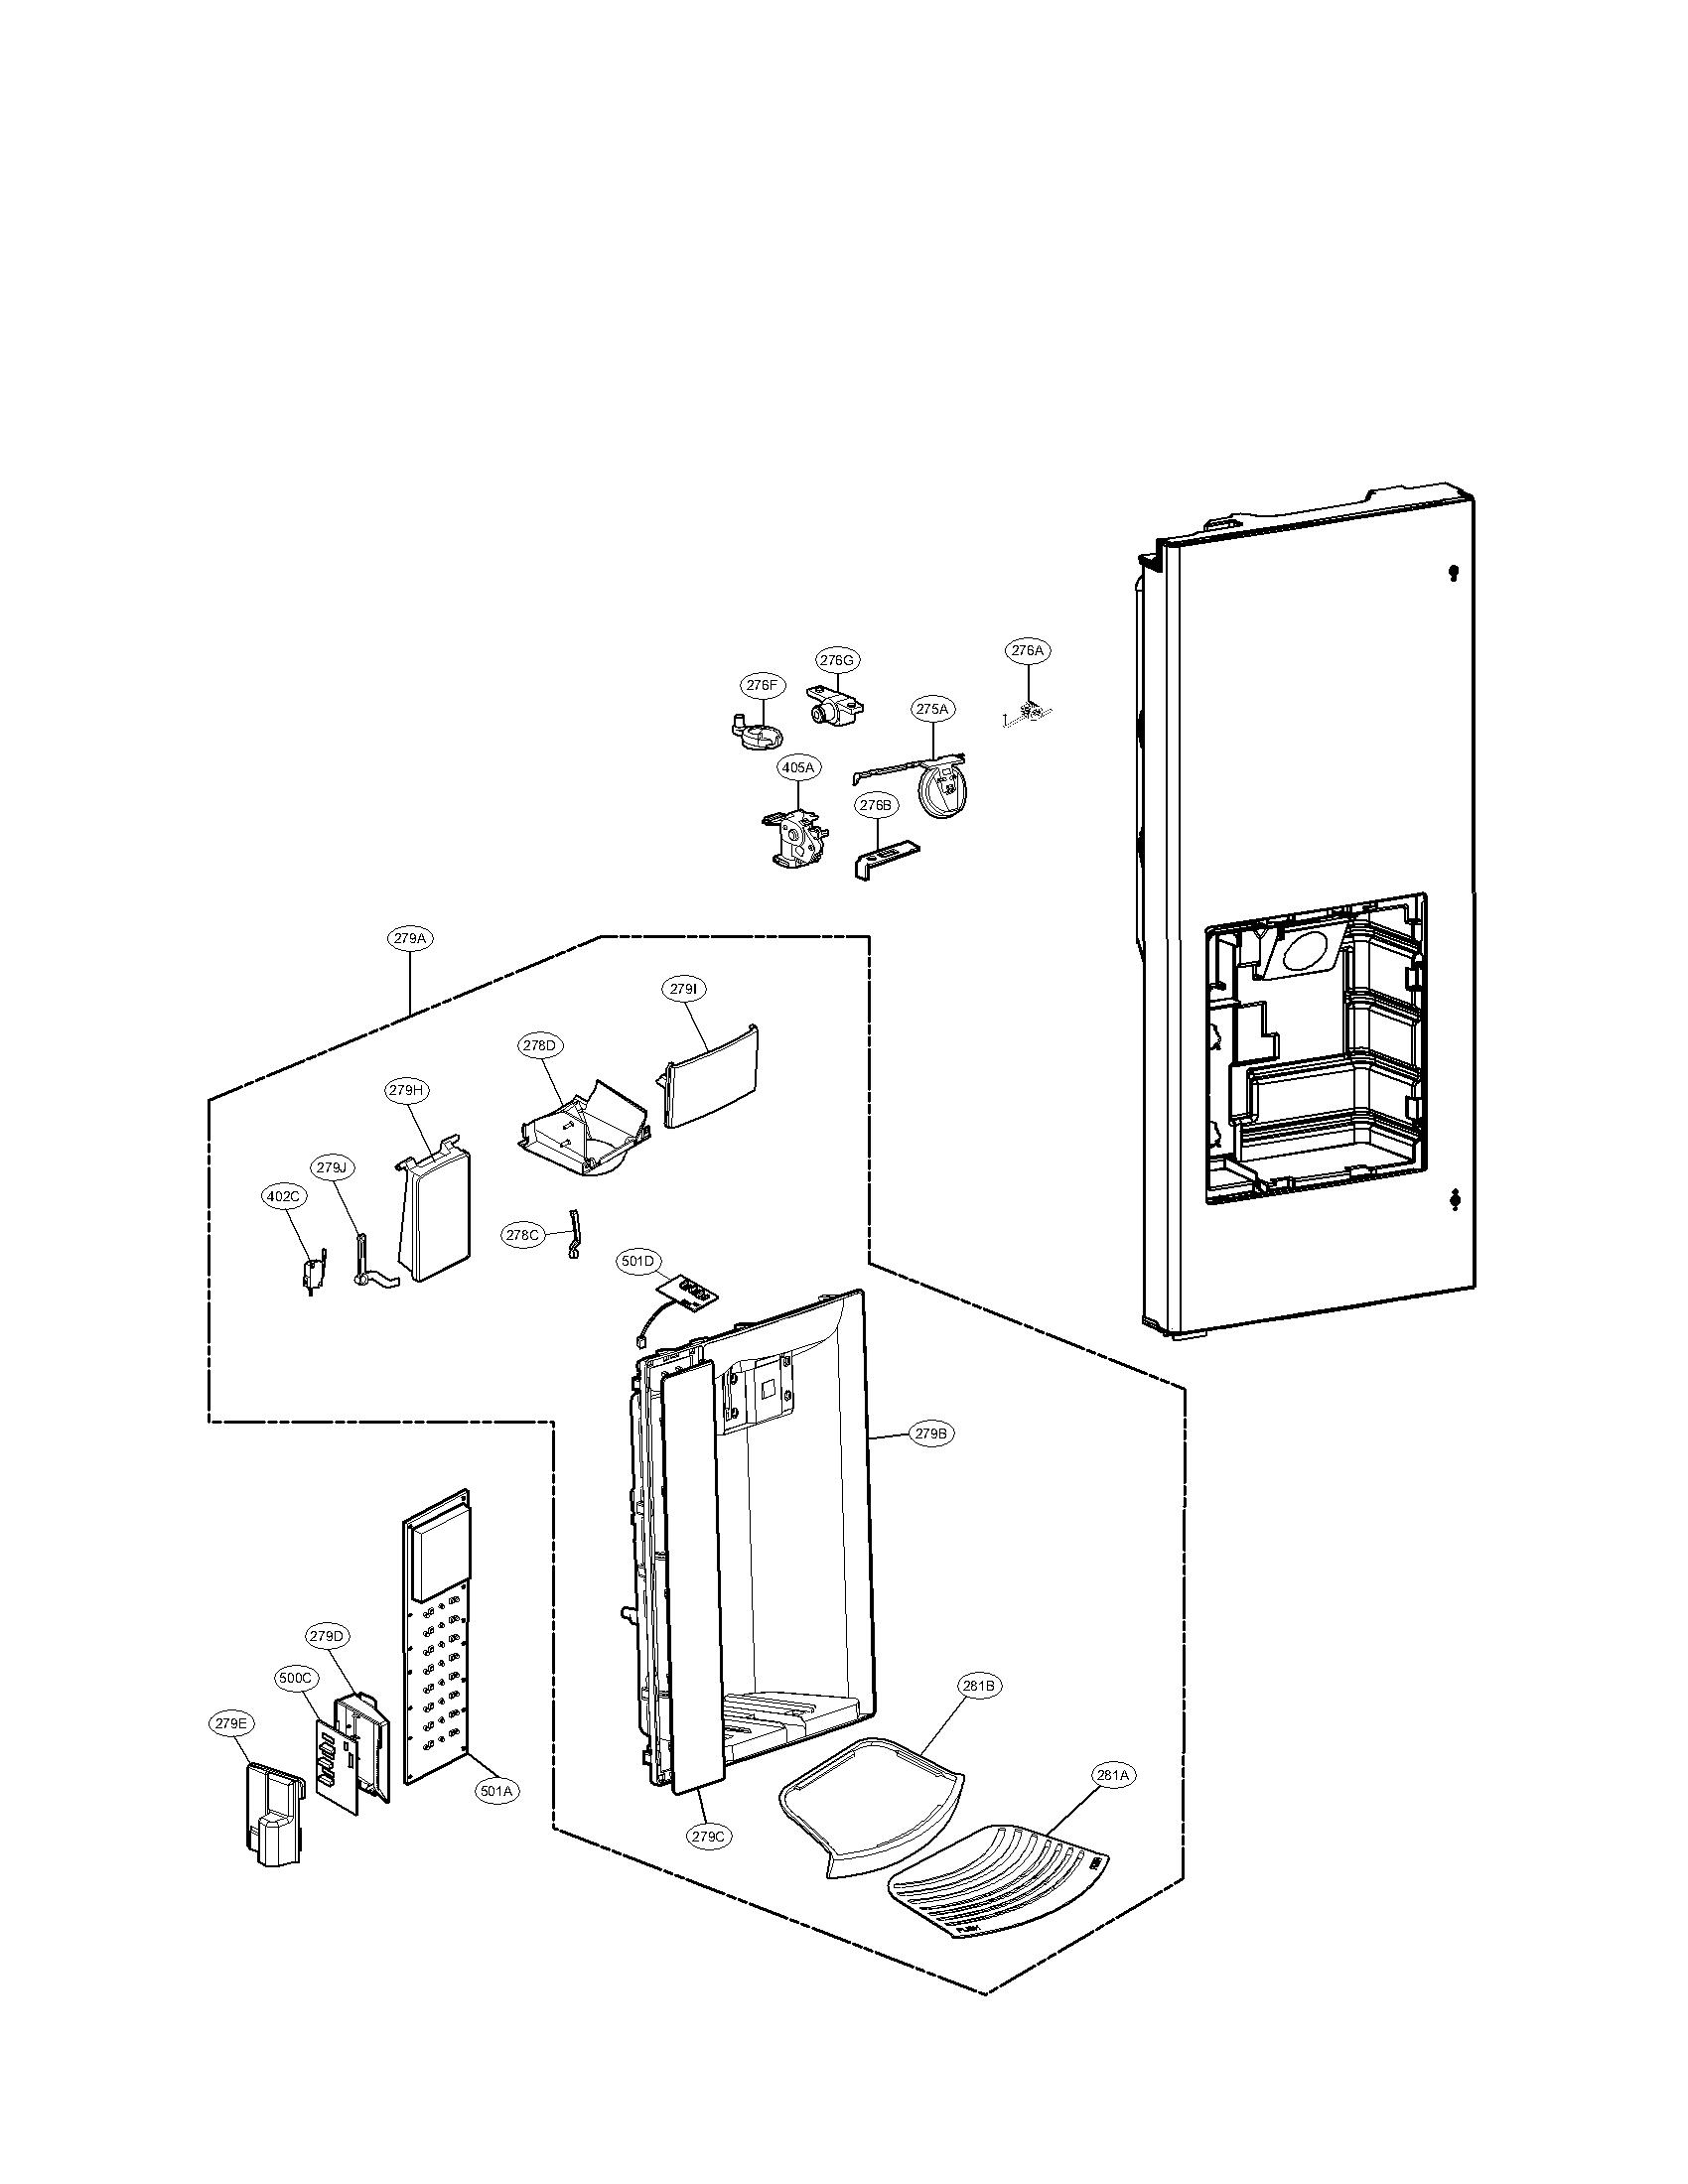 Lg model LFX28978SB/00 bottom-mount refrigerator genuine parts